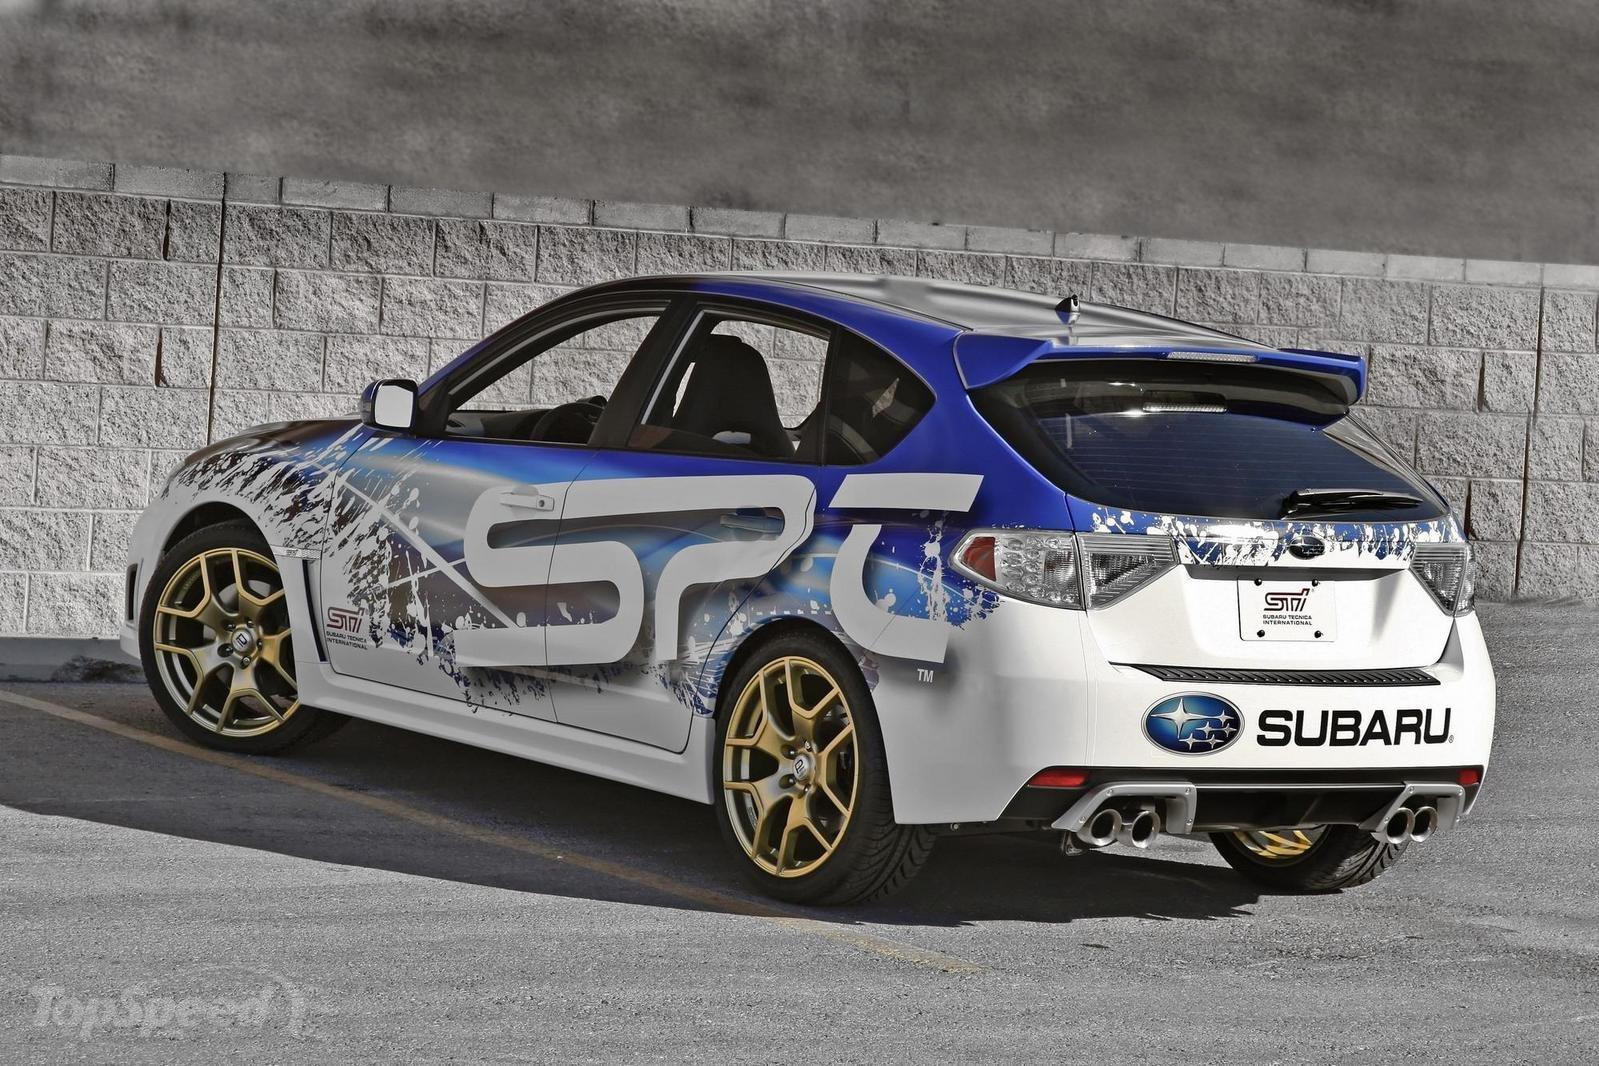 Subaru WRX STI Hatchback 2.5 (300 Hp) Turbo | Technical ...